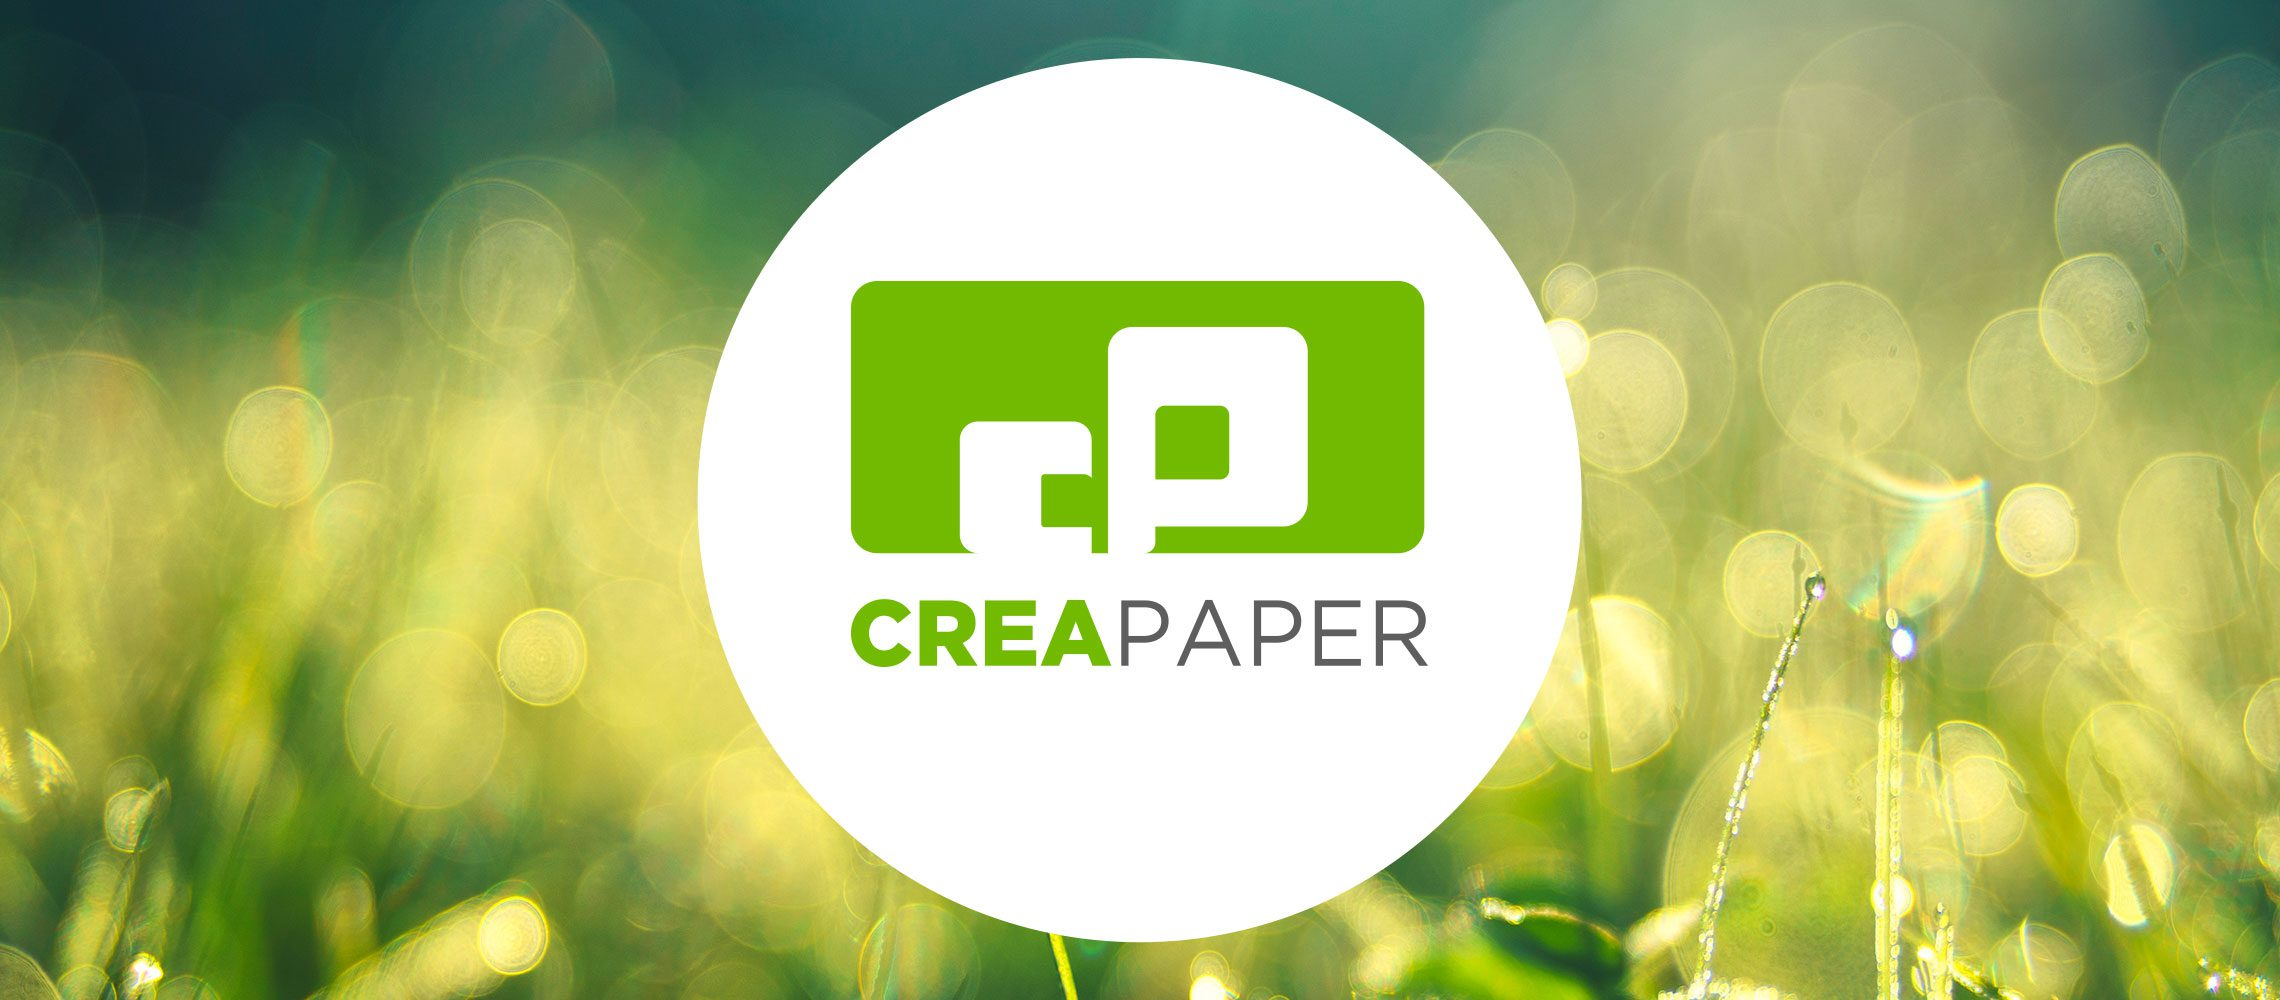 CREAPAPER_POST_2280x1000